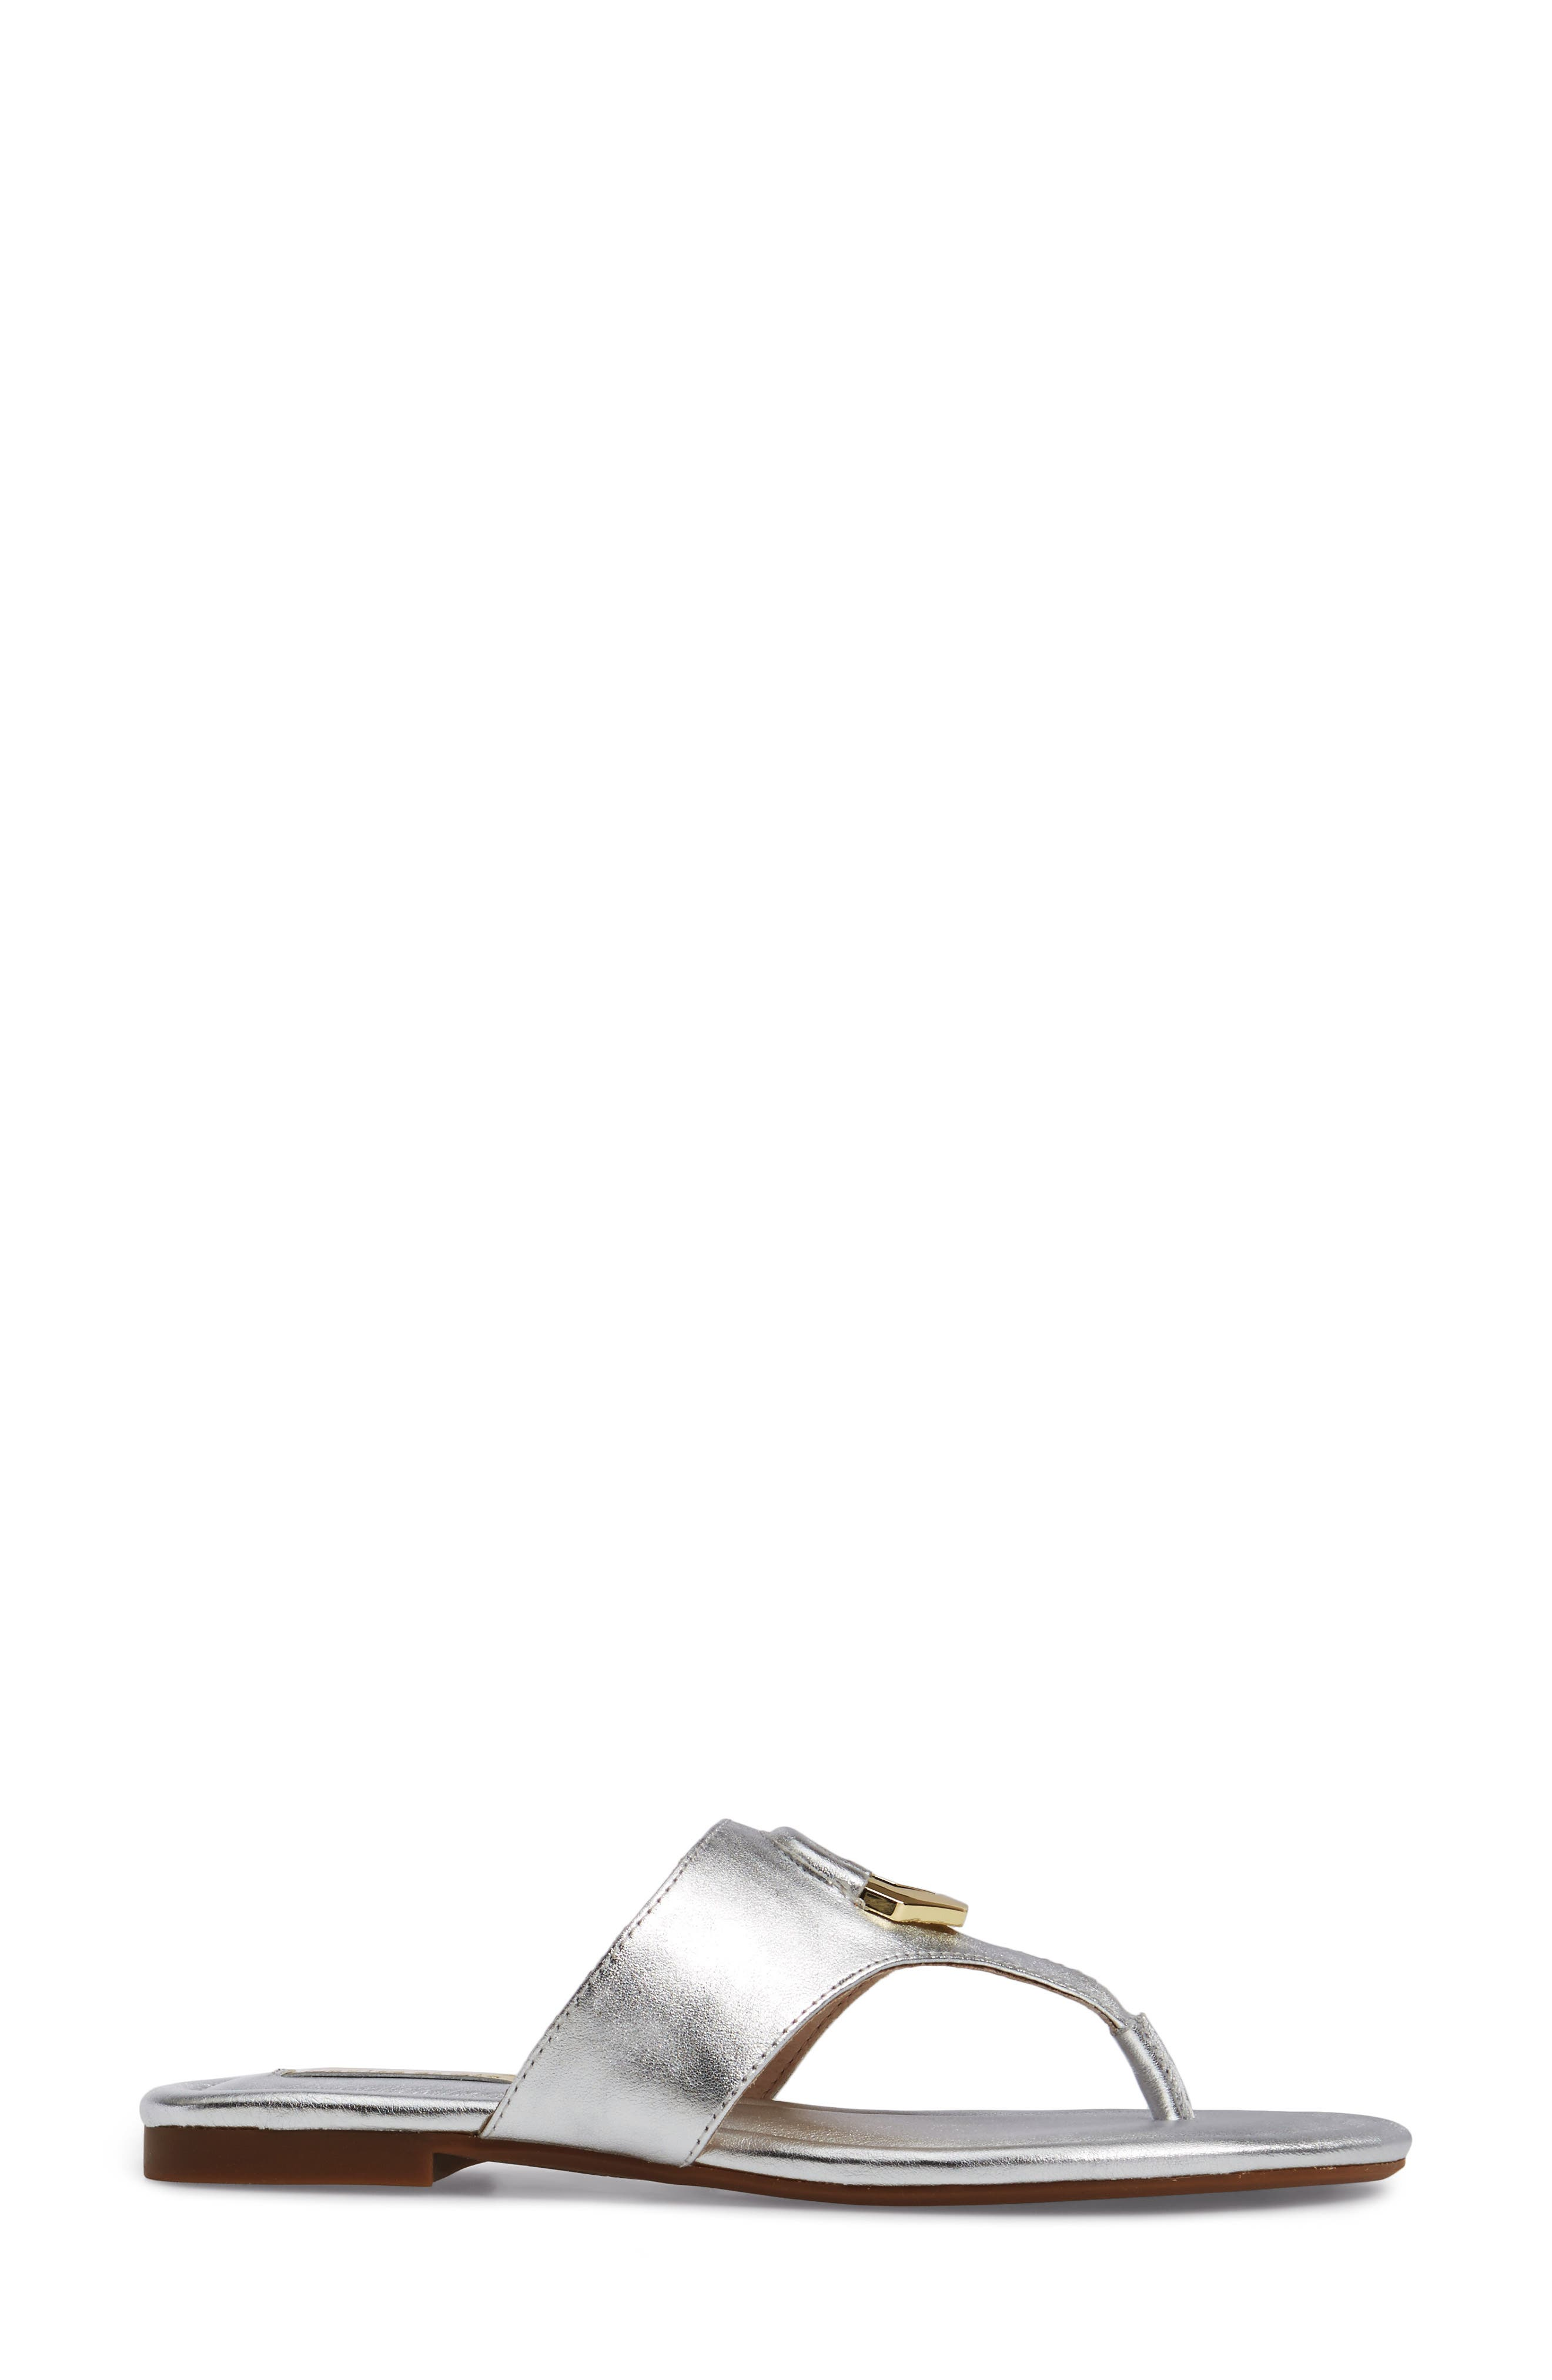 Adana Flip Flop,                             Alternate thumbnail 3, color,                             Sterling Leather